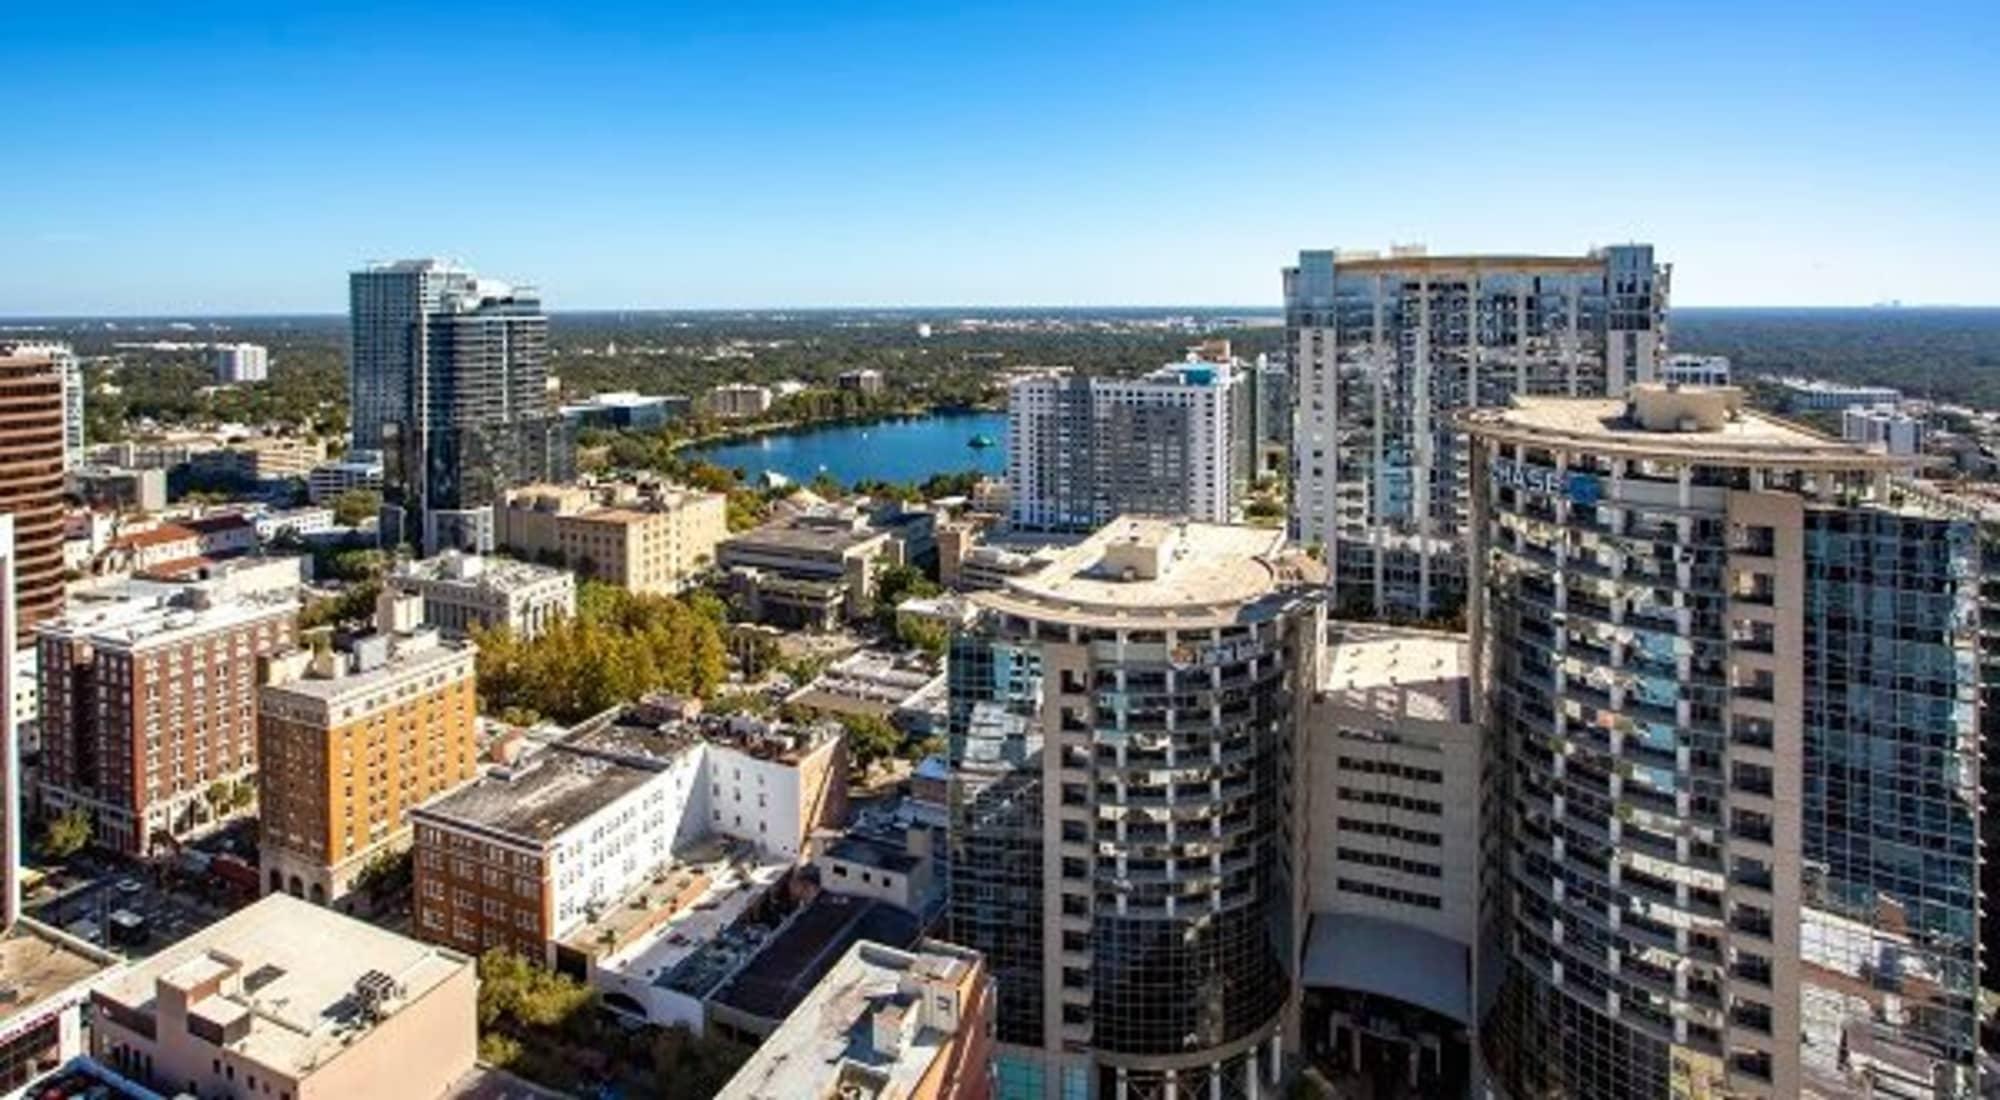 55 West Apartments in Orlando, Florida